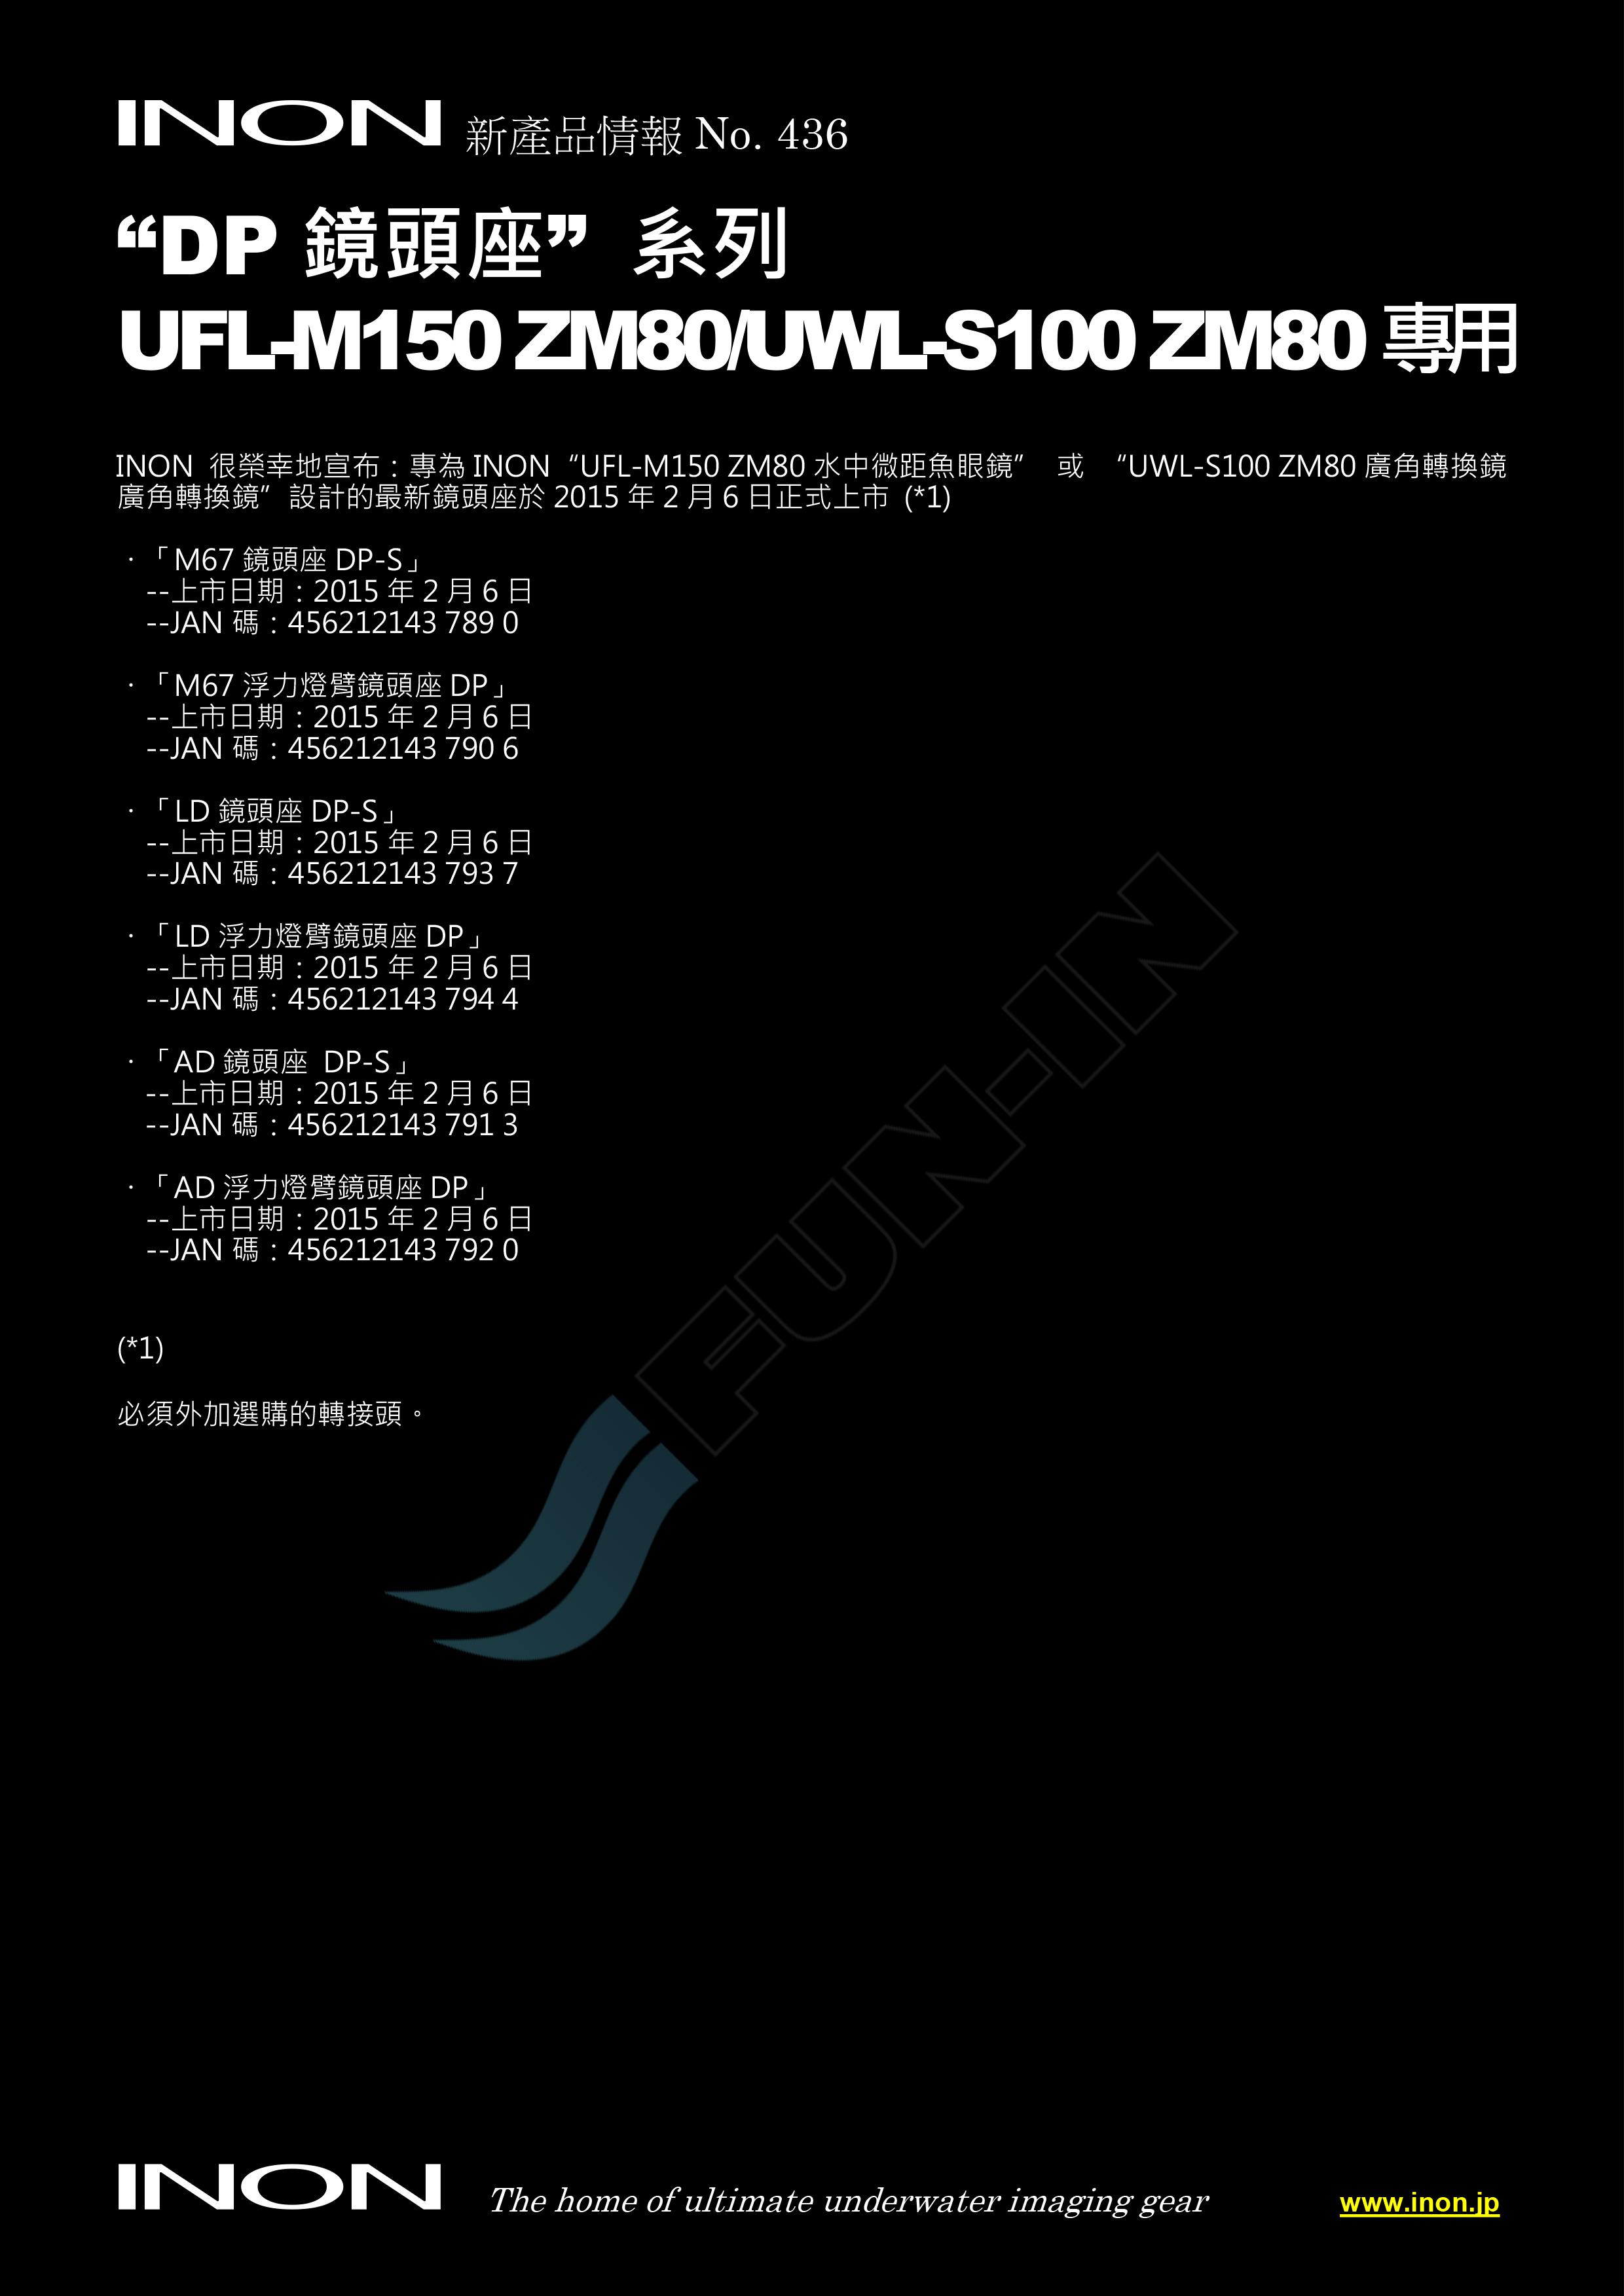 Pre-release information